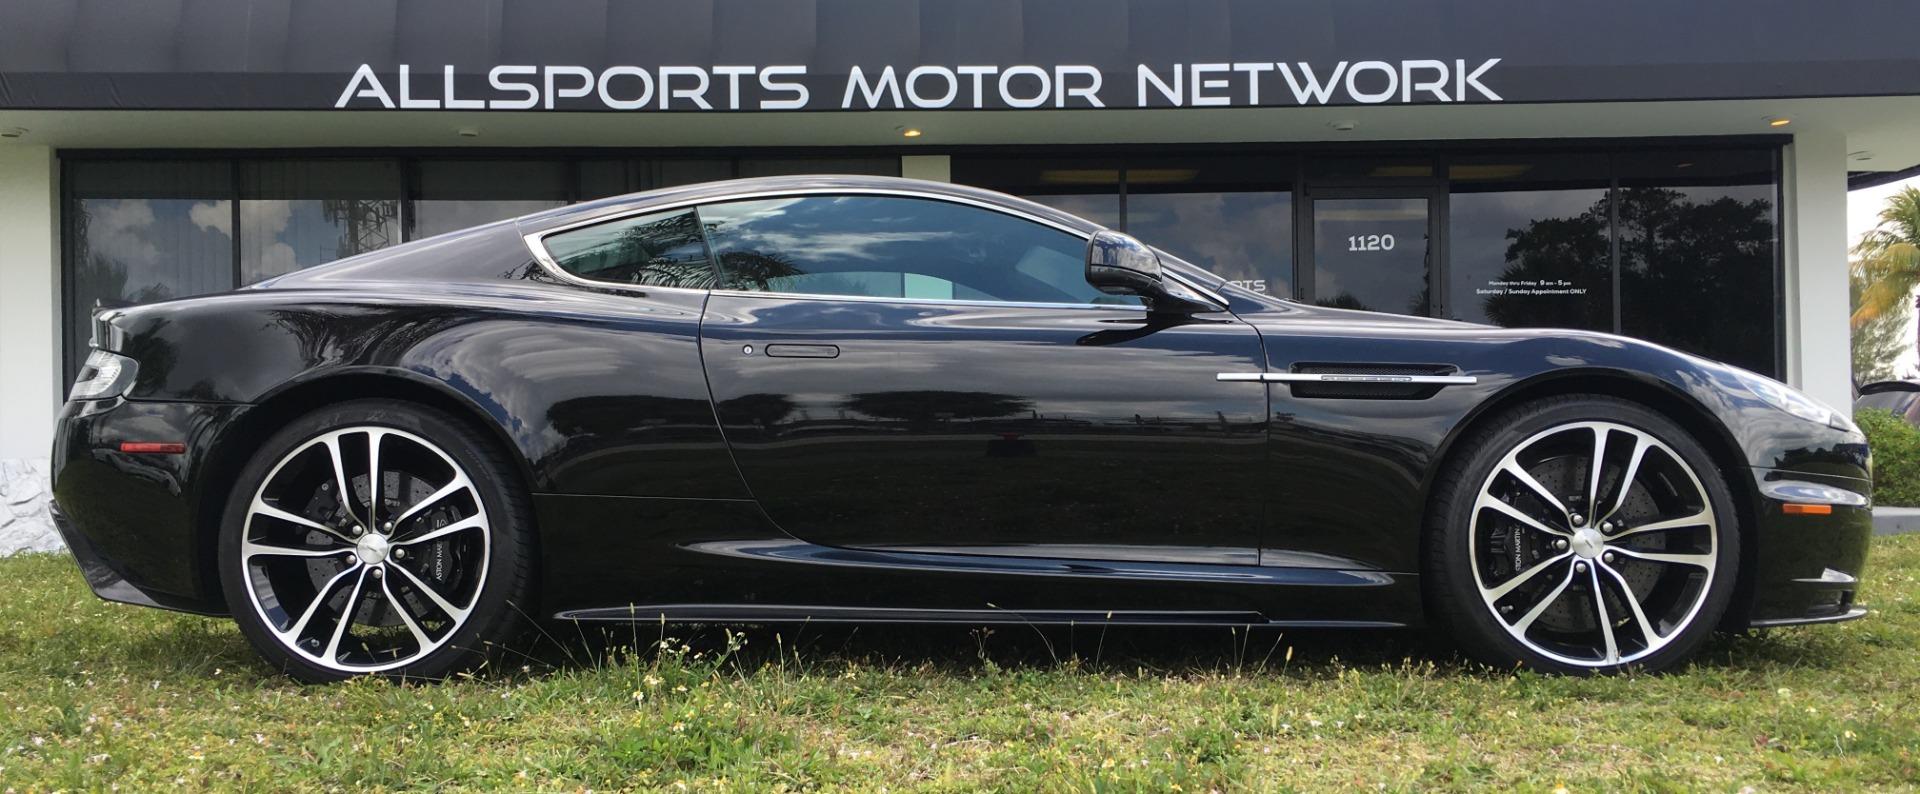 2011 Aston Martin Dbs Carbon Edition For Sale In Miami Fl E02785 All Sports Motor Network